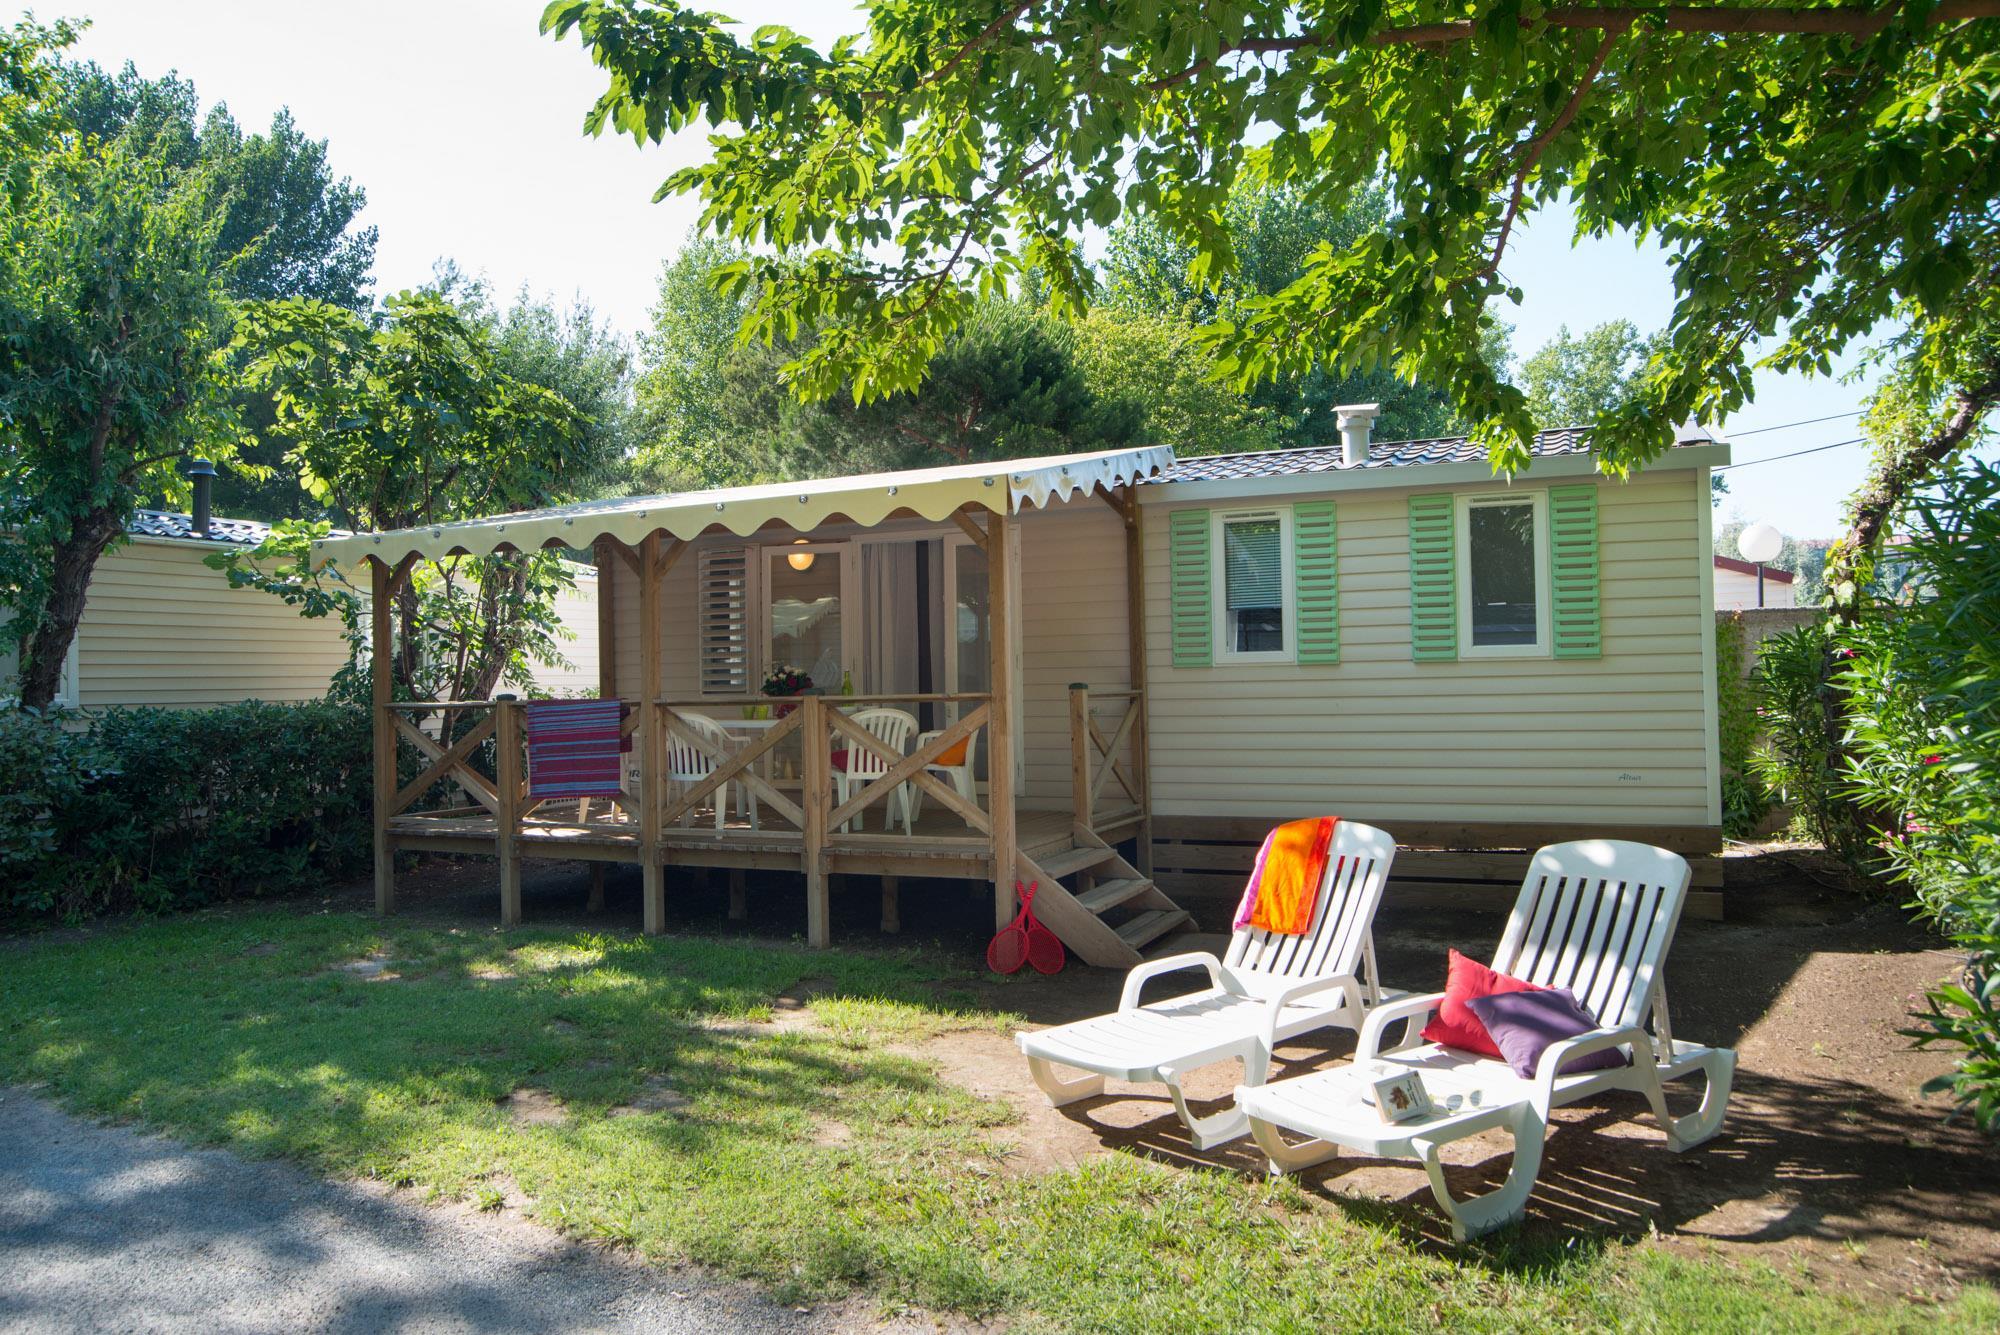 Location - Cottage Grand Méditerranéen - Camping Abri de Camargue